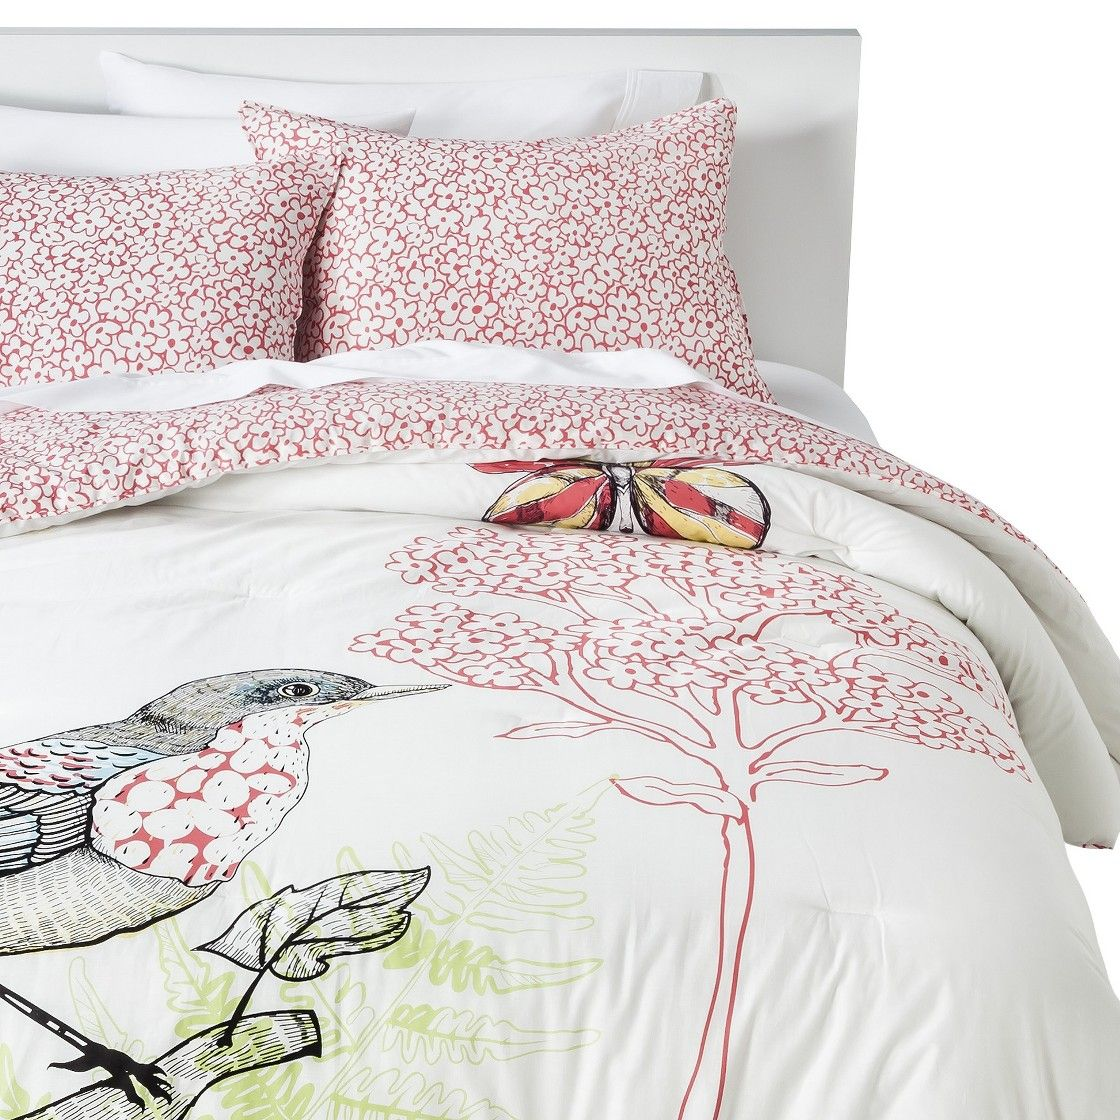 Willow Comforter Set - Multicolor